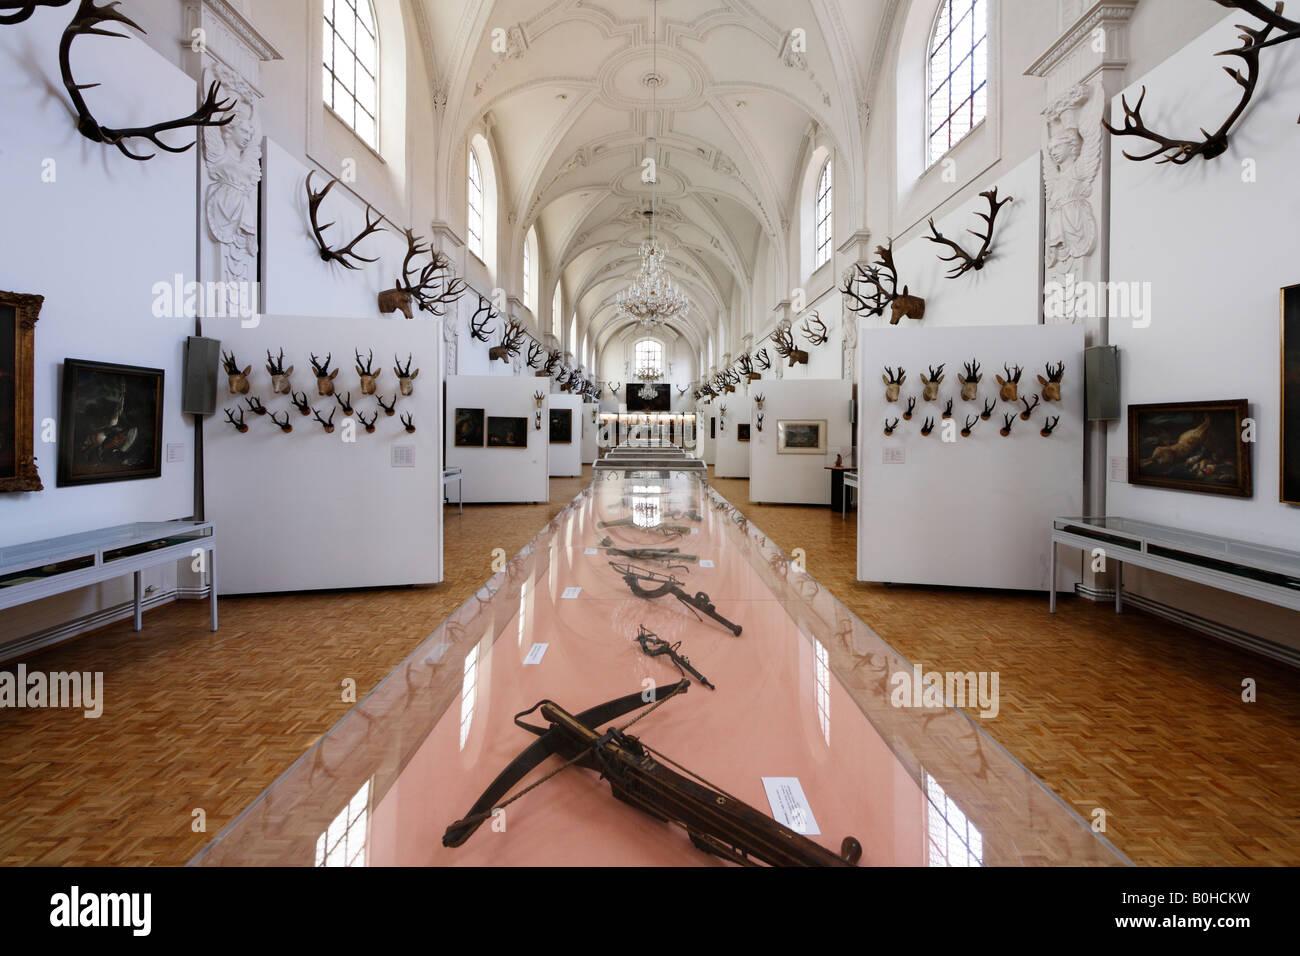 White Hall, Deutsches Jagd- und Fischereimuseum, German Hunting and Fishing Museum in the former Augustinerkirche - Stock Image